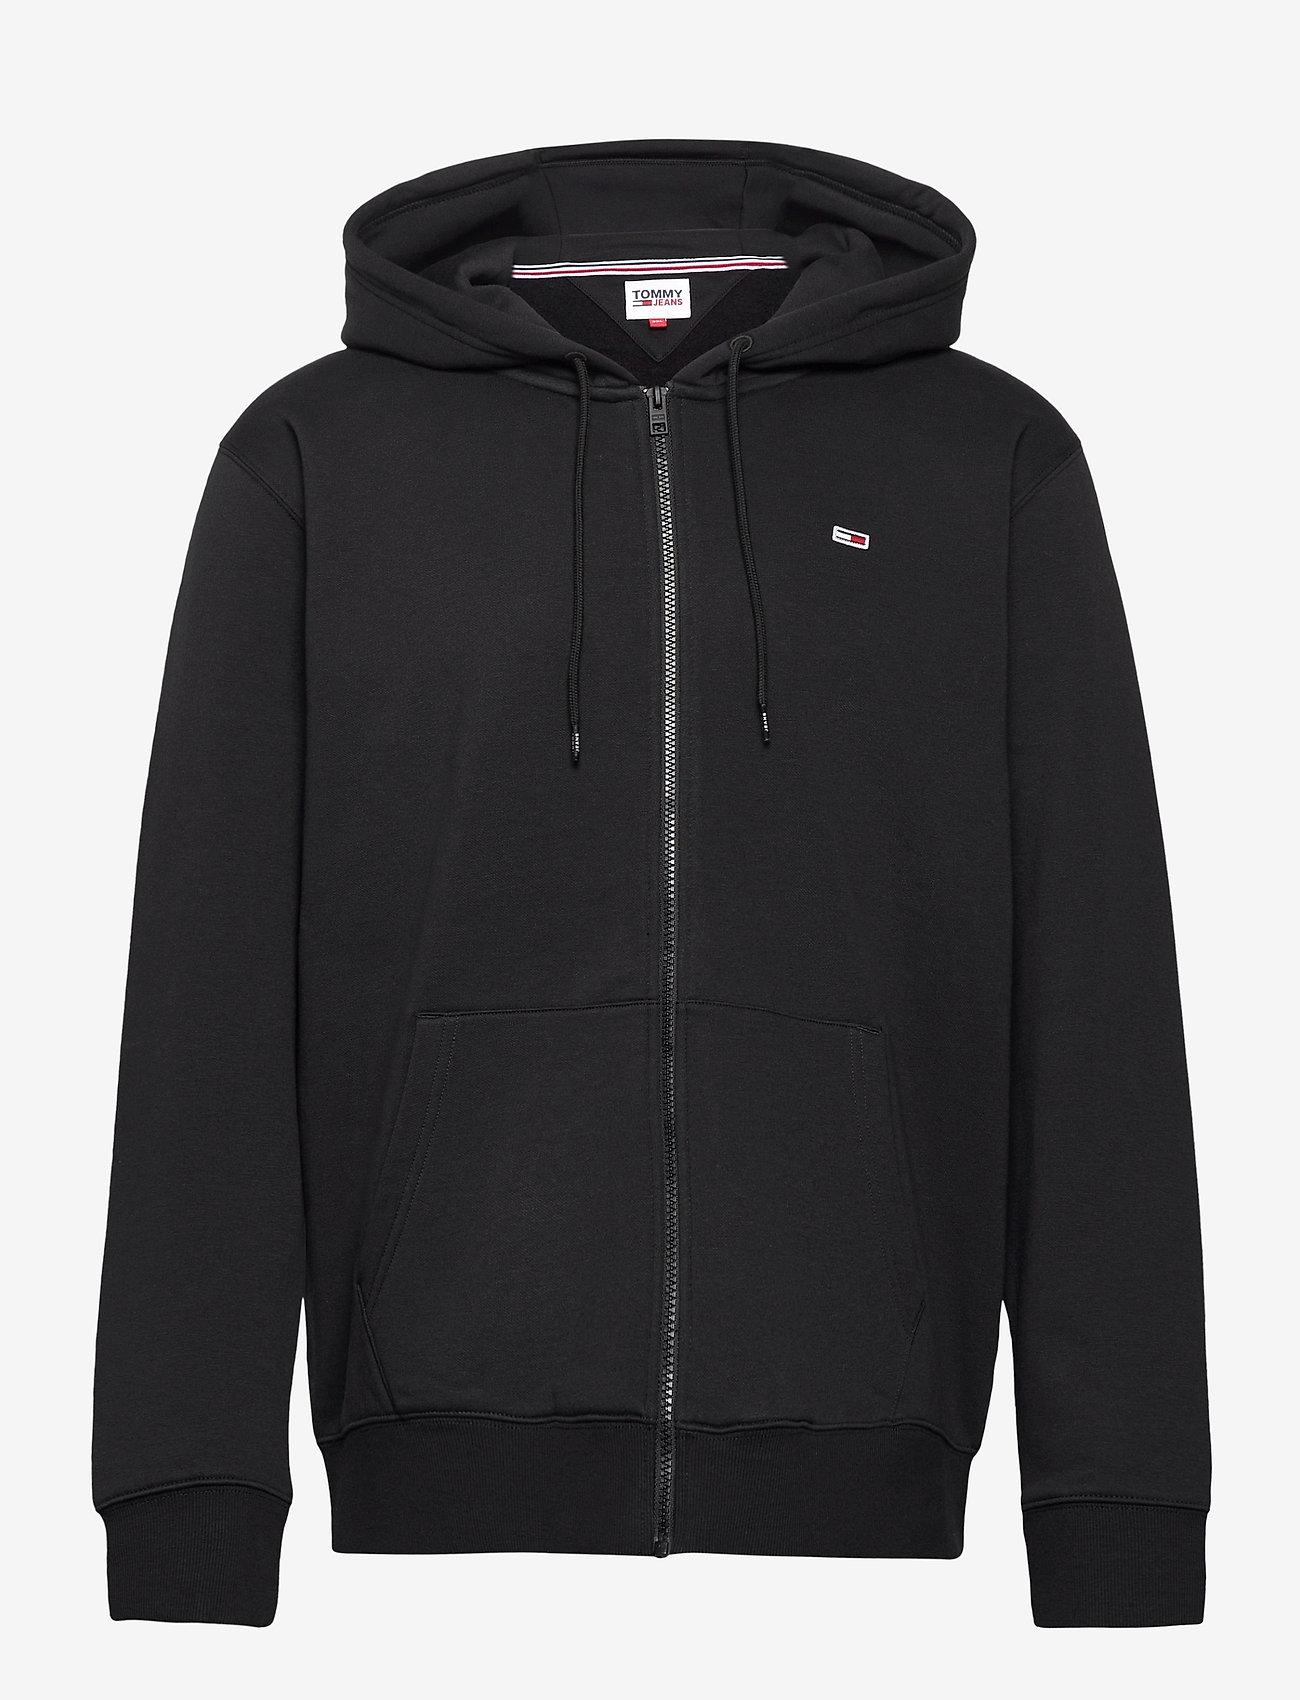 Tommy Jeans - TJM REGULAR FLEECE ZIP HOODIE - hoodies - black - 0